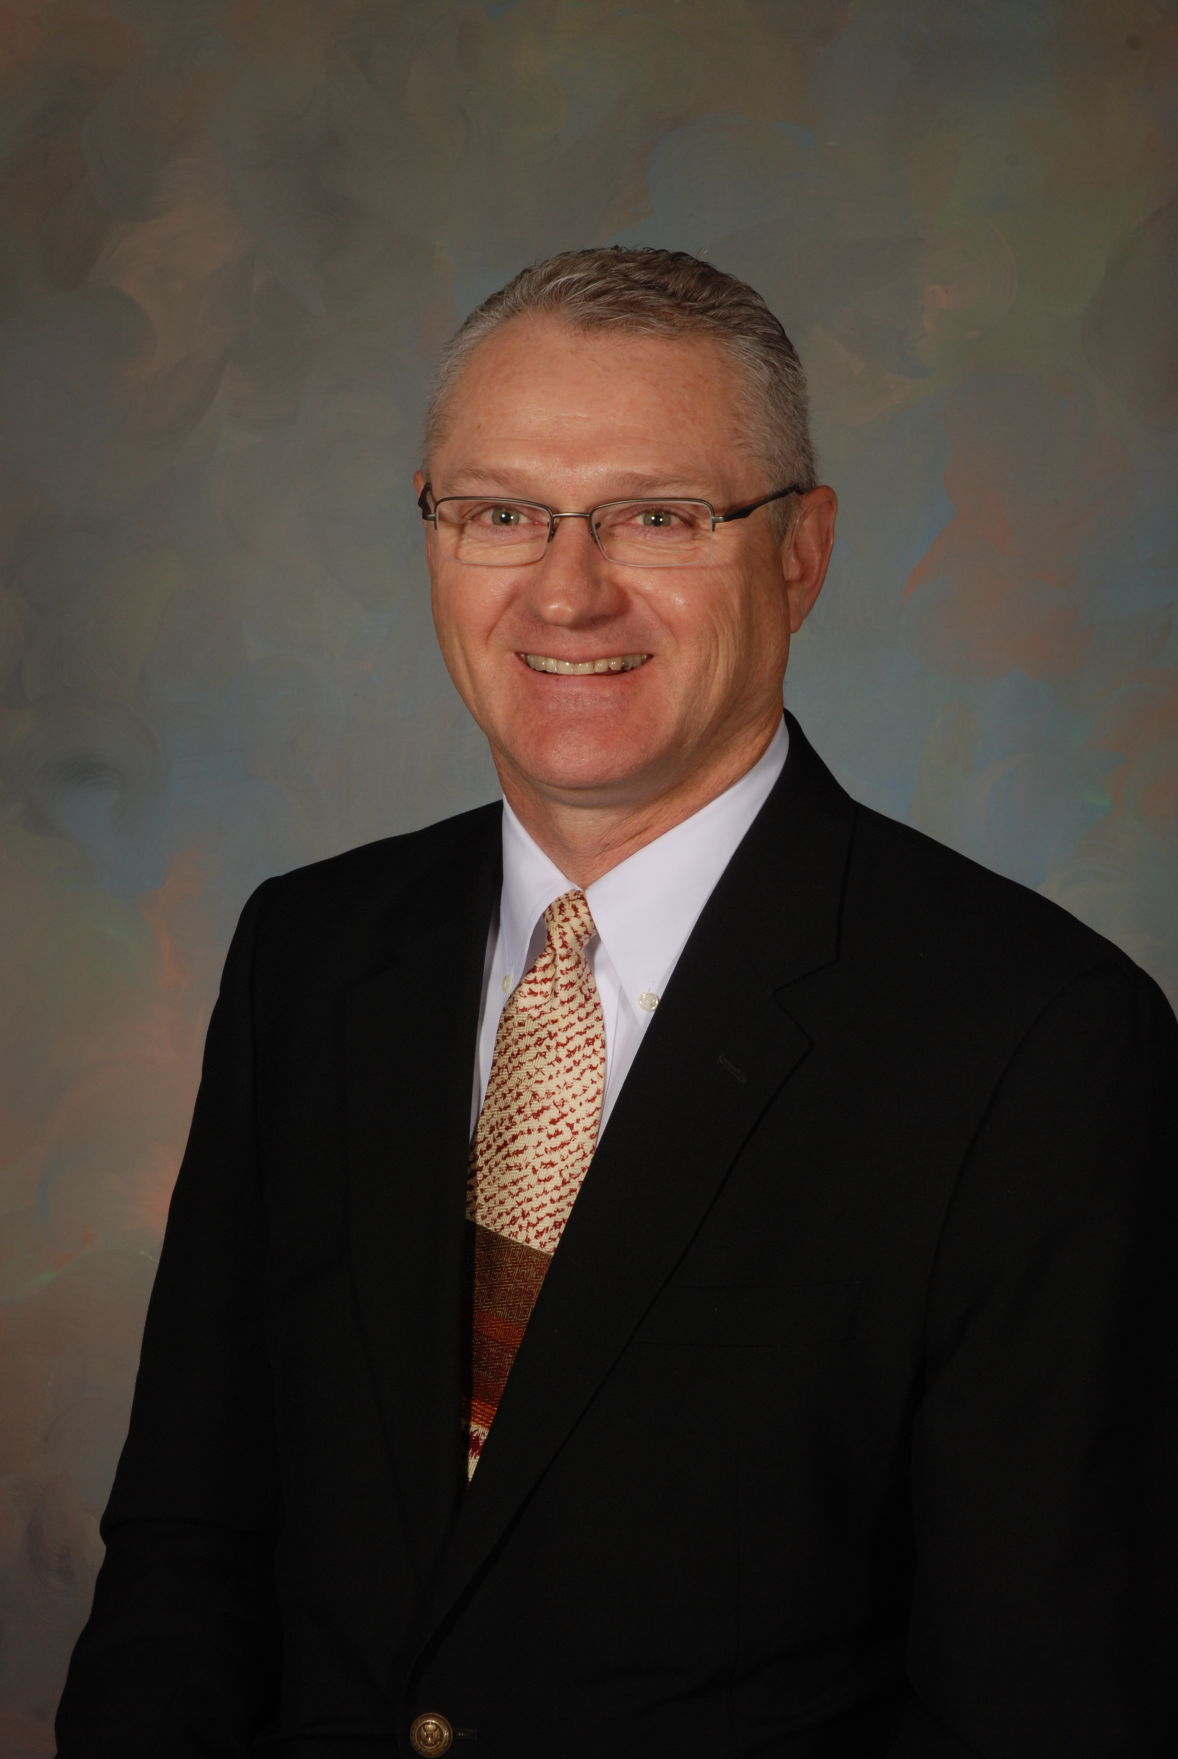 Mike McAlpine